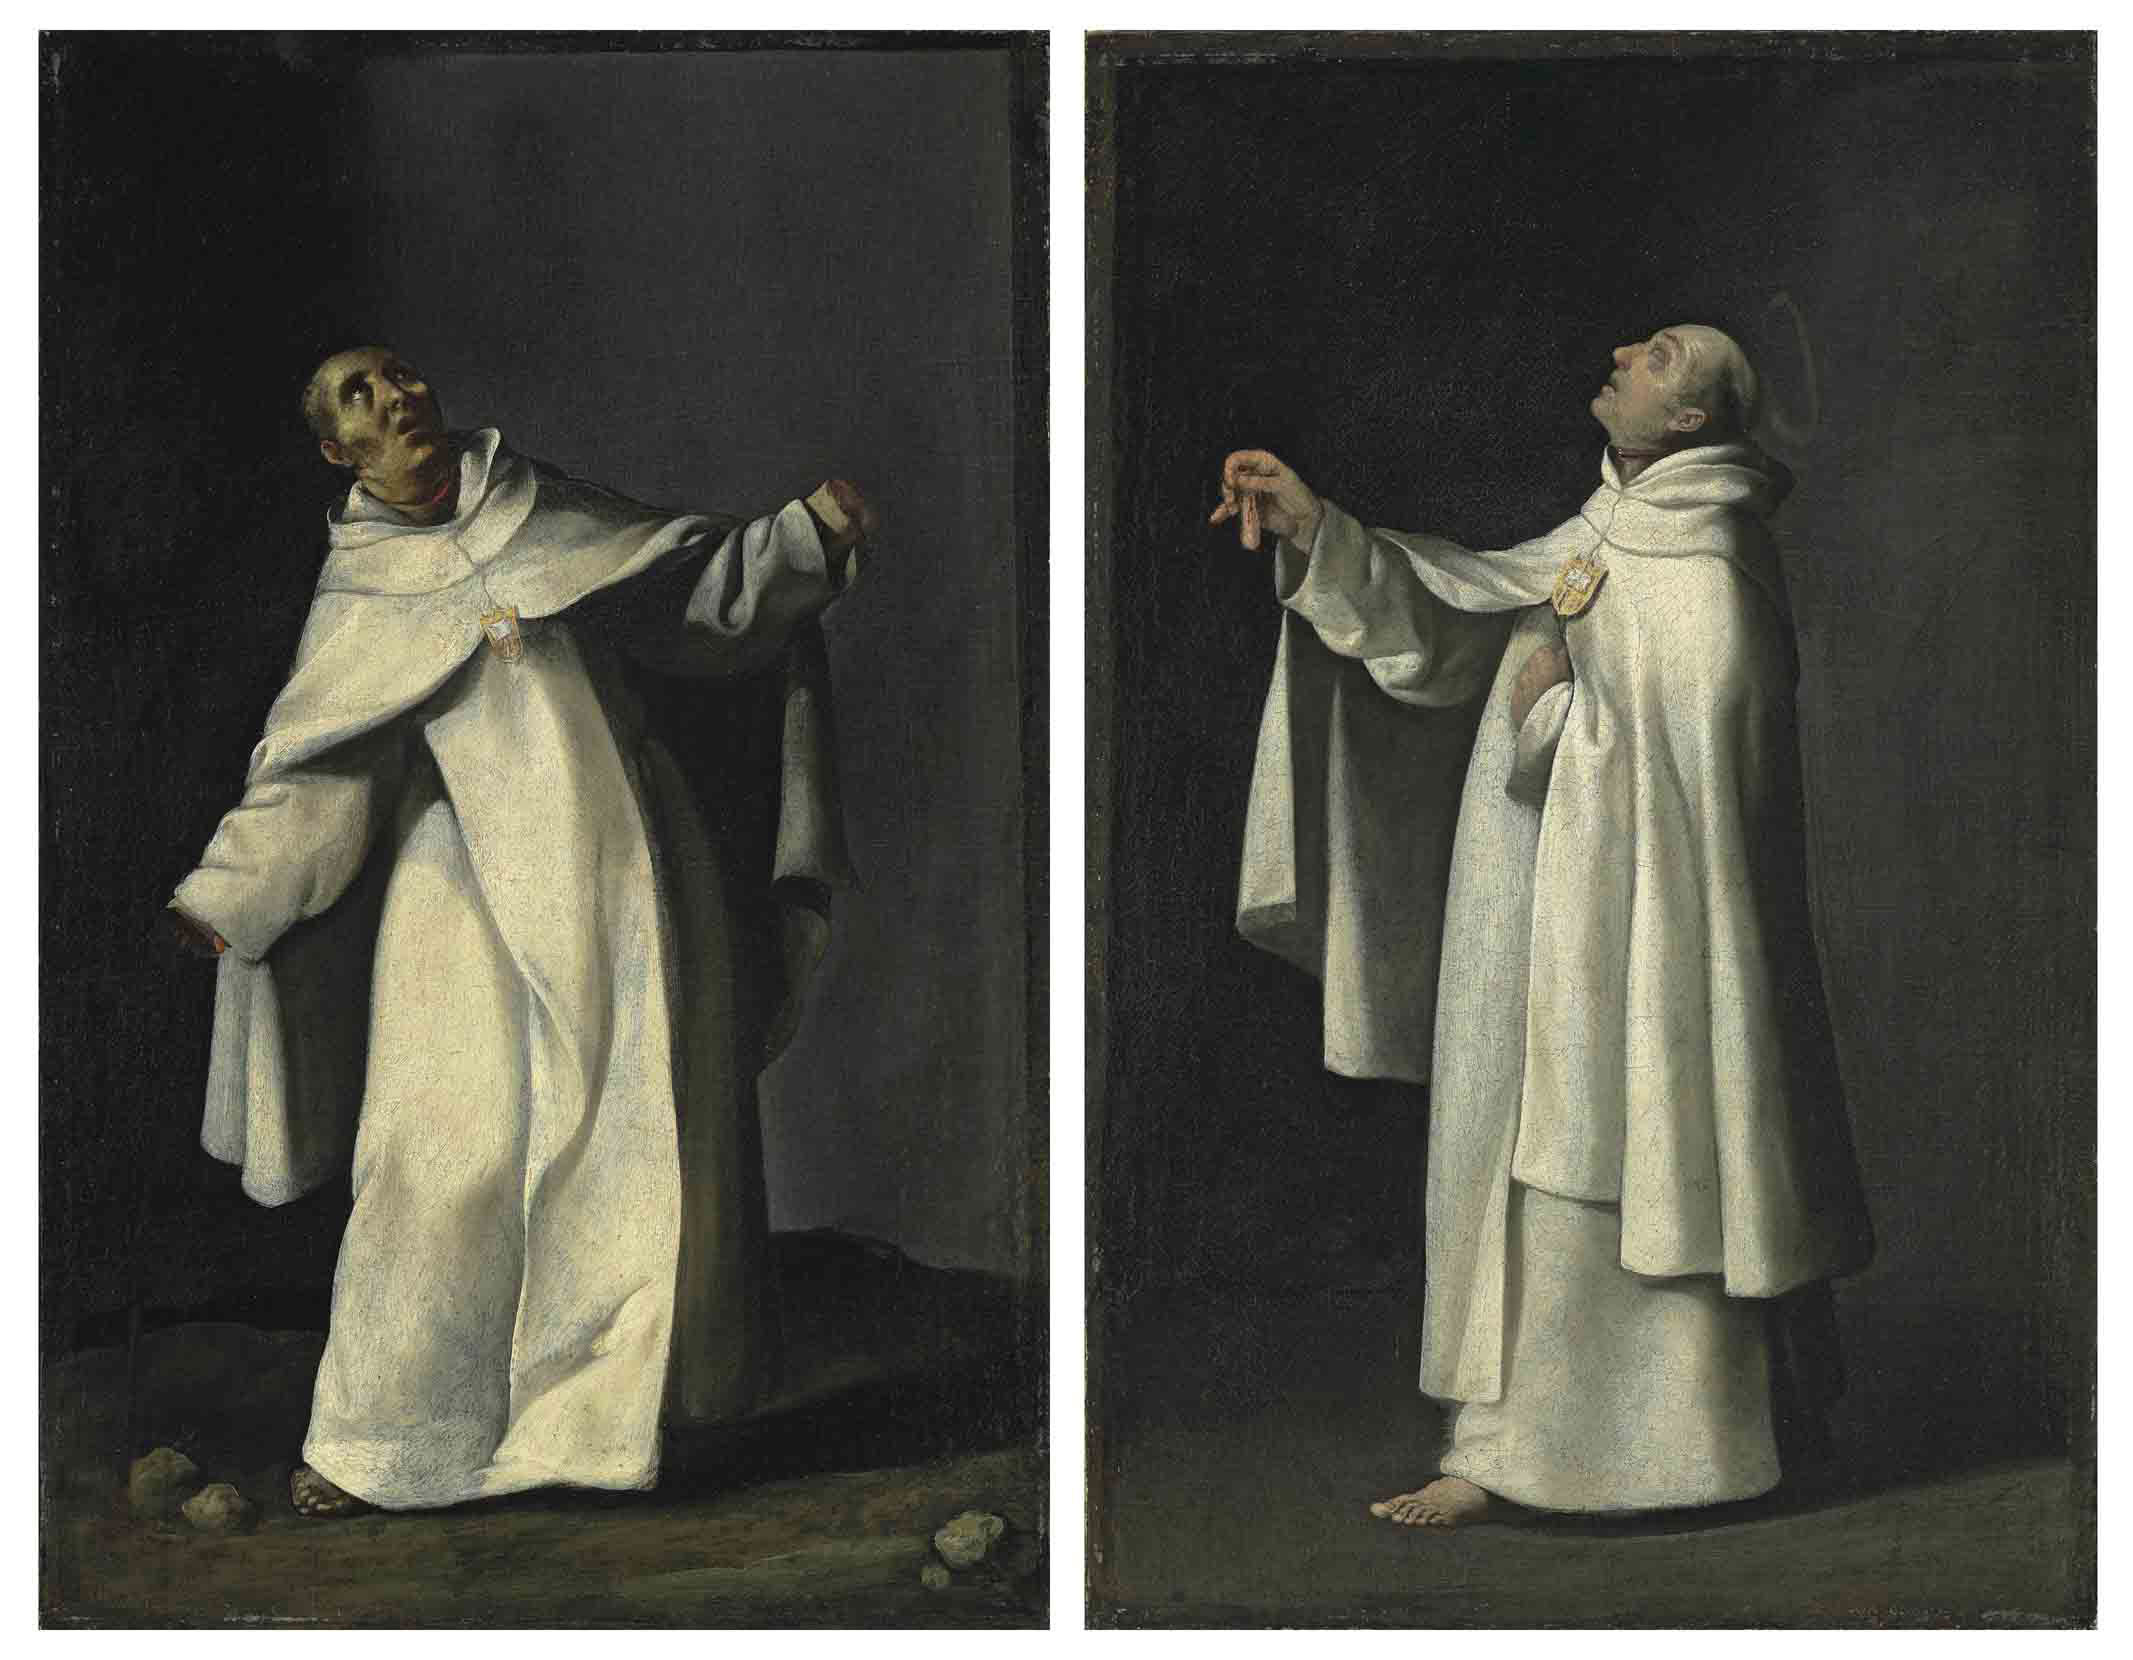 Friar Pedro de Beteta; and Friar Guillermo de Valencia